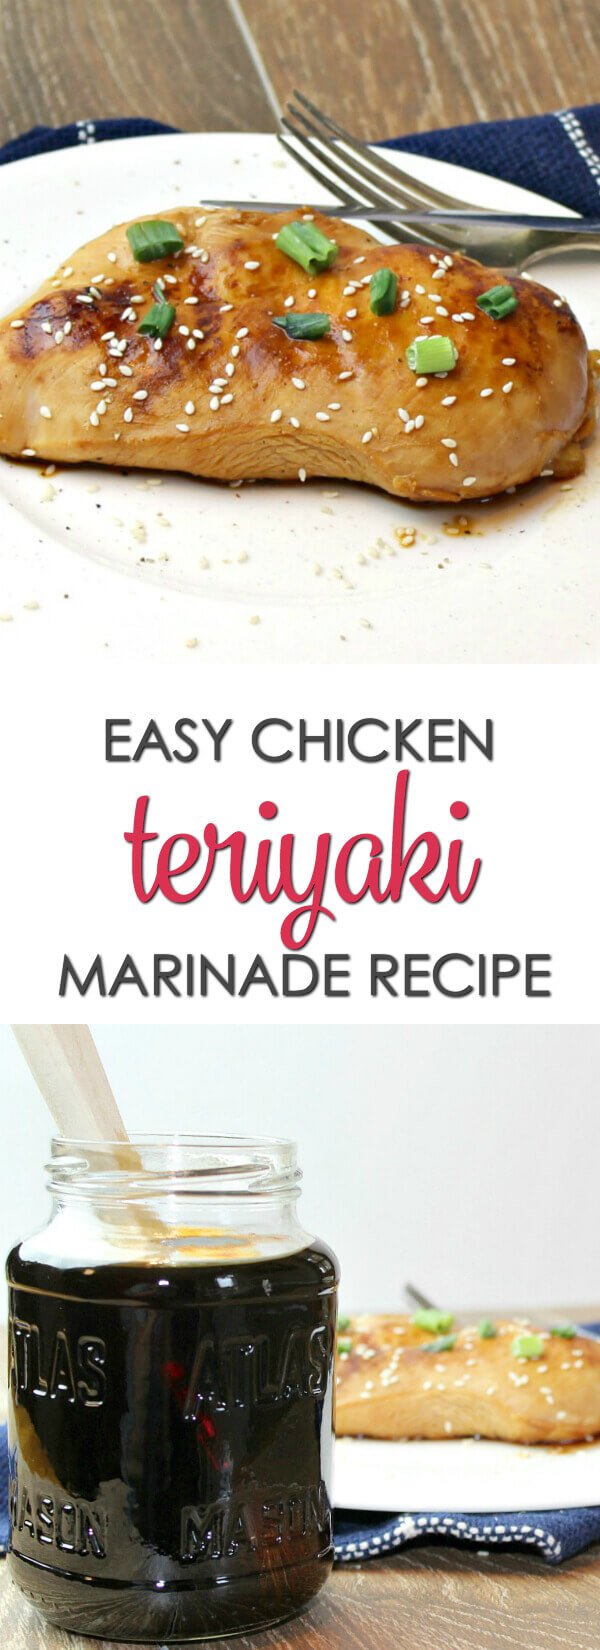 Chicken Teriyaki Marinade Recipe - this easy teriyaki sauce marinade recipe packs a ton of flavor